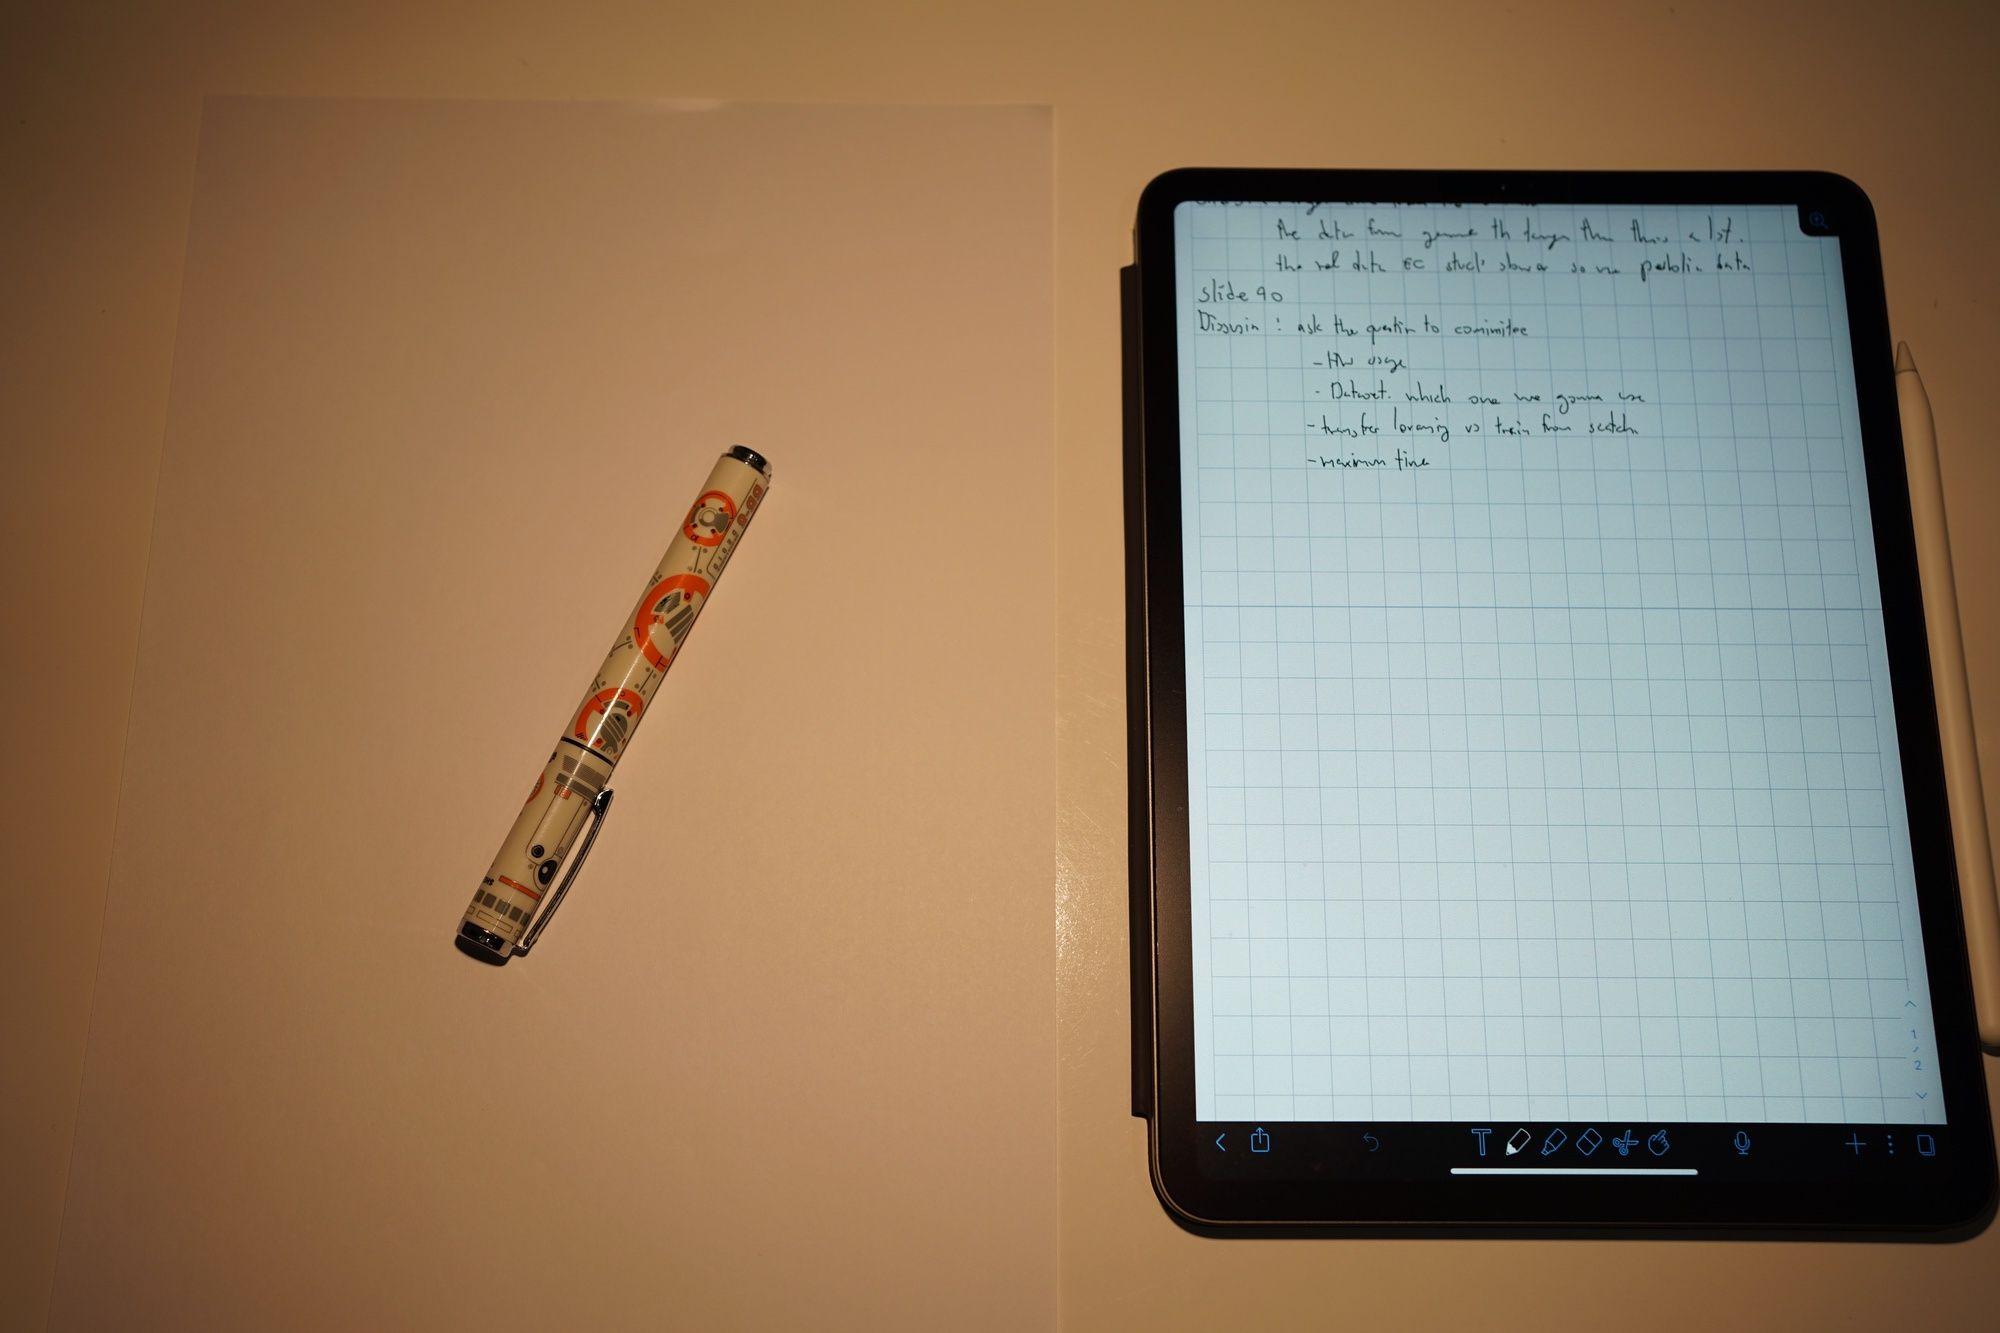 Productive Series: ทำไมเราชอบใช้กระดาษจดงานมากกว่า iPad ?